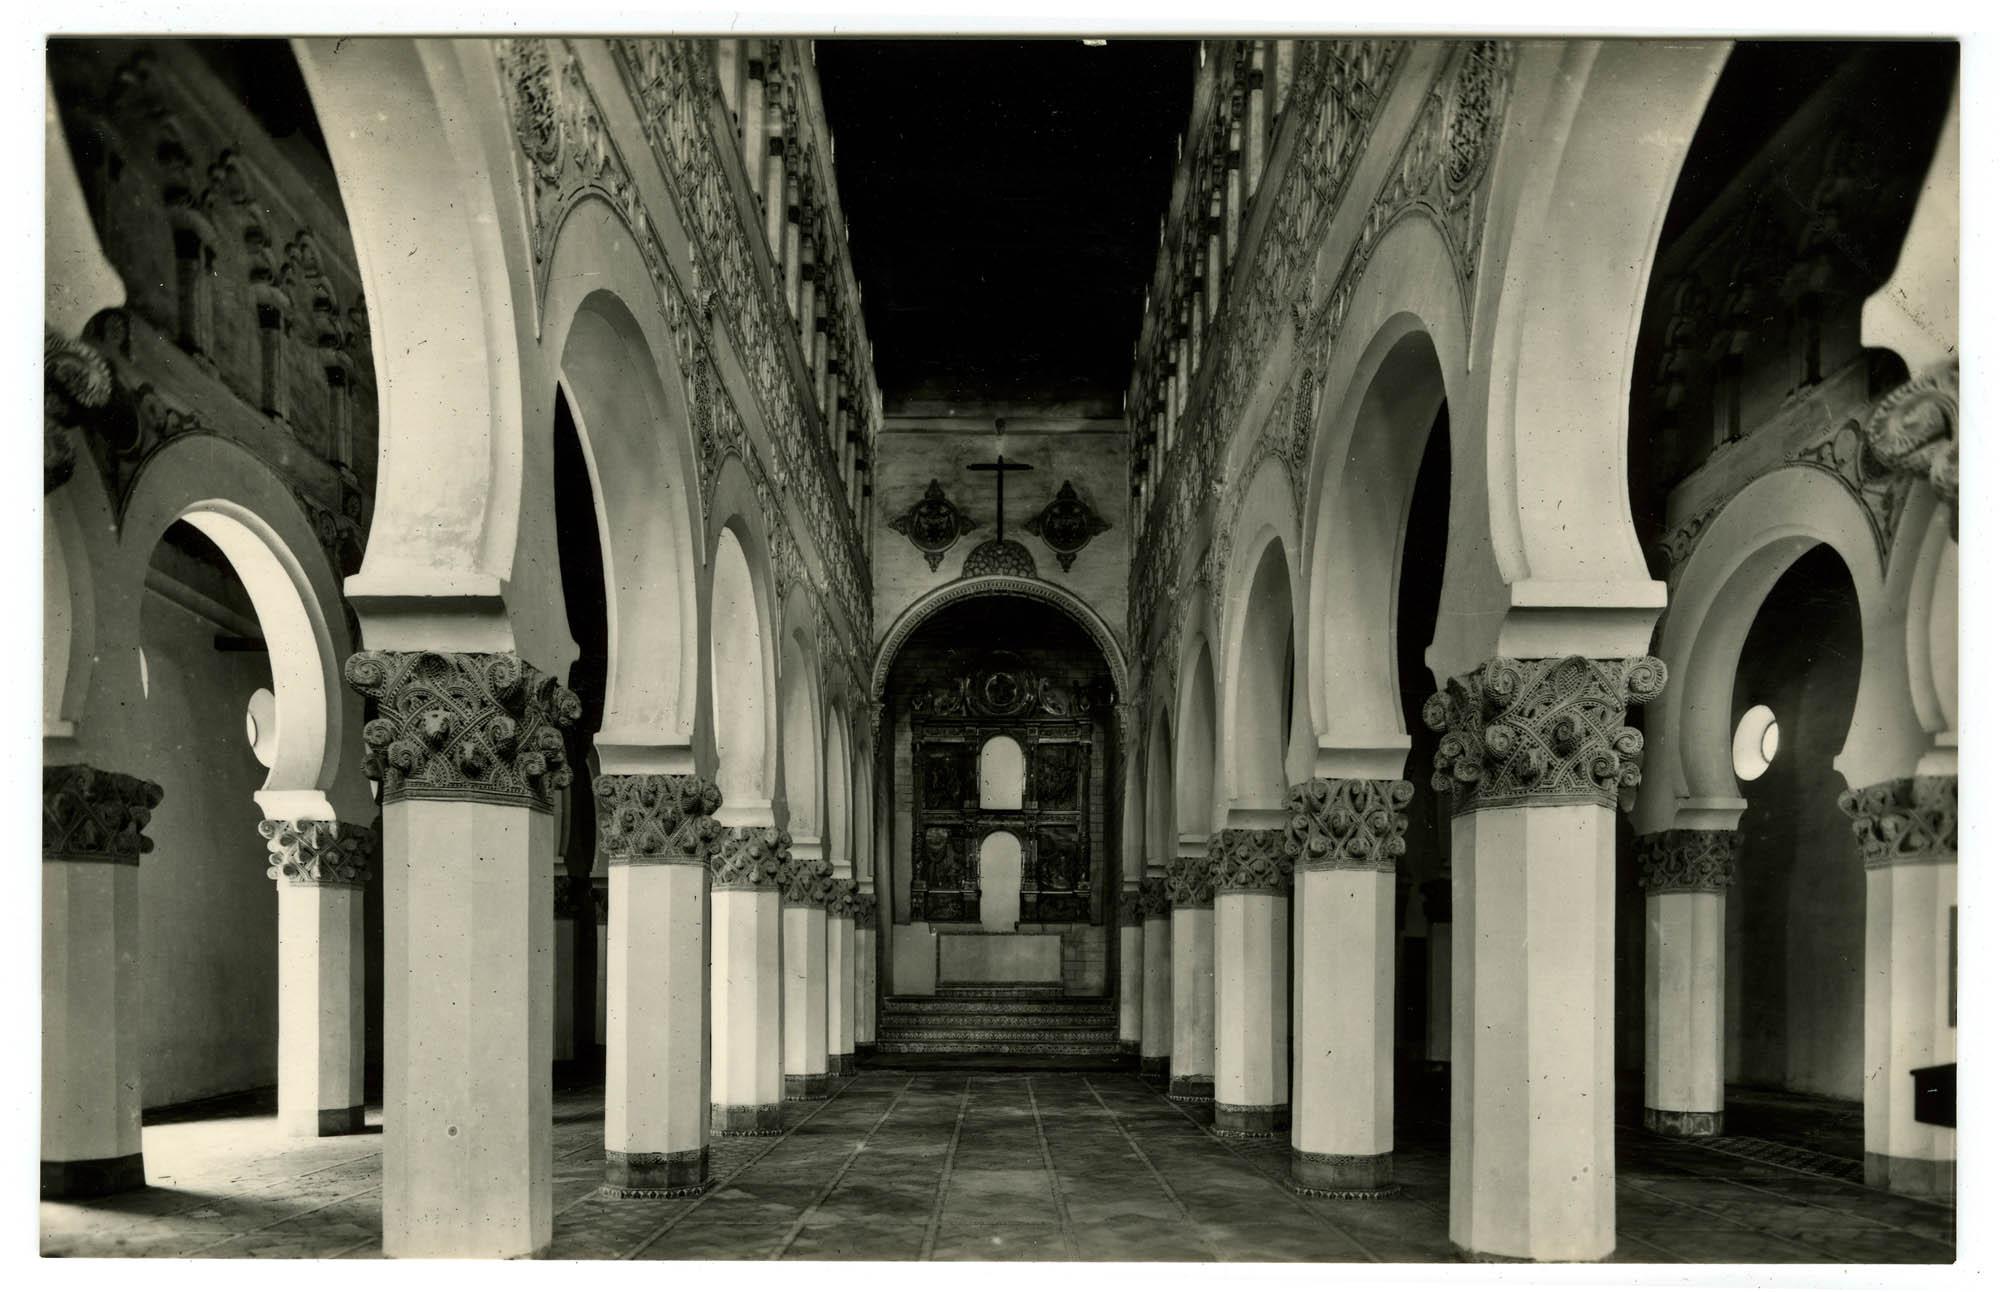 Toledo. Santa María la Blanca (siglo XIII) / Sainte Marie la Blanche (siècle XIII) / Saint Mary the White (XIII century)